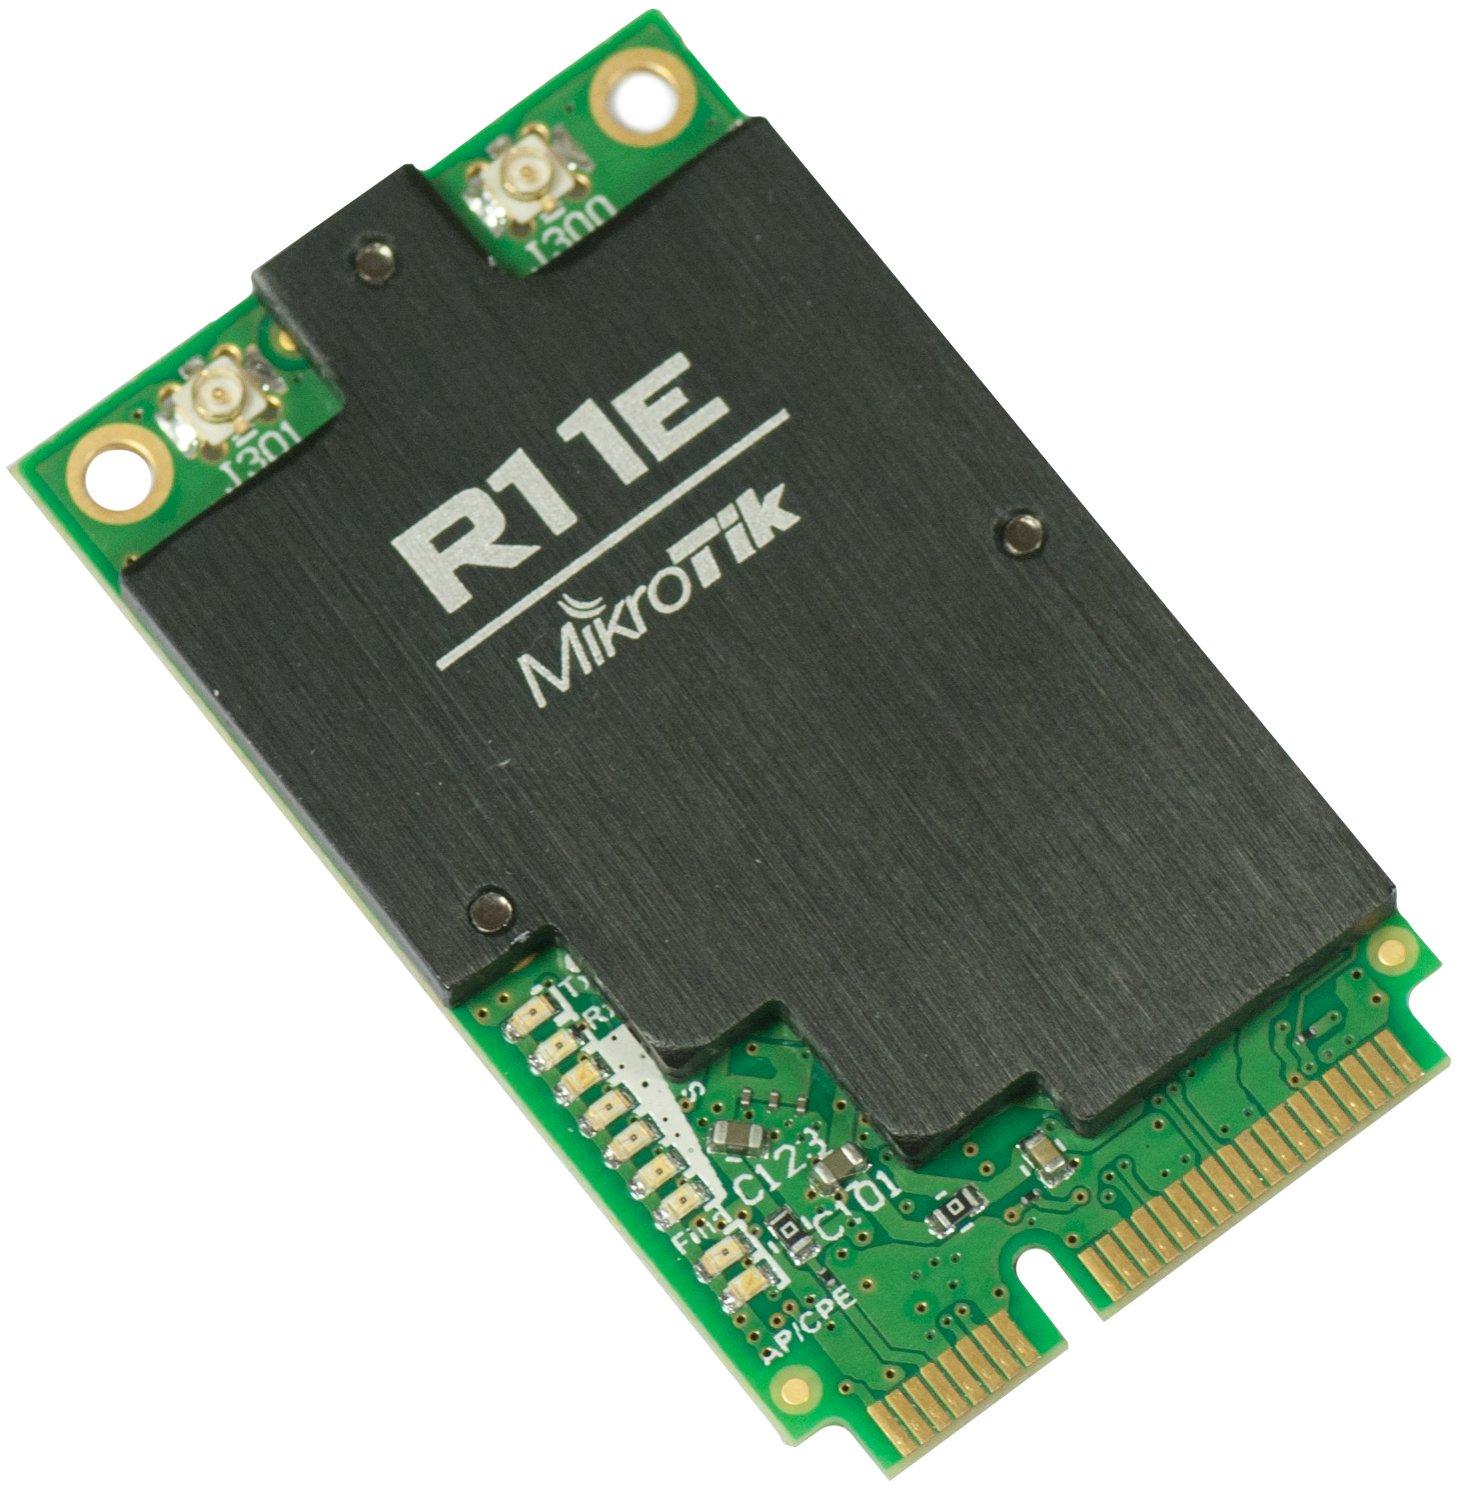 Mini Pcie Mikrotik R11e-2hnd 2.4ghz 802.11b/g 800mw Card 2